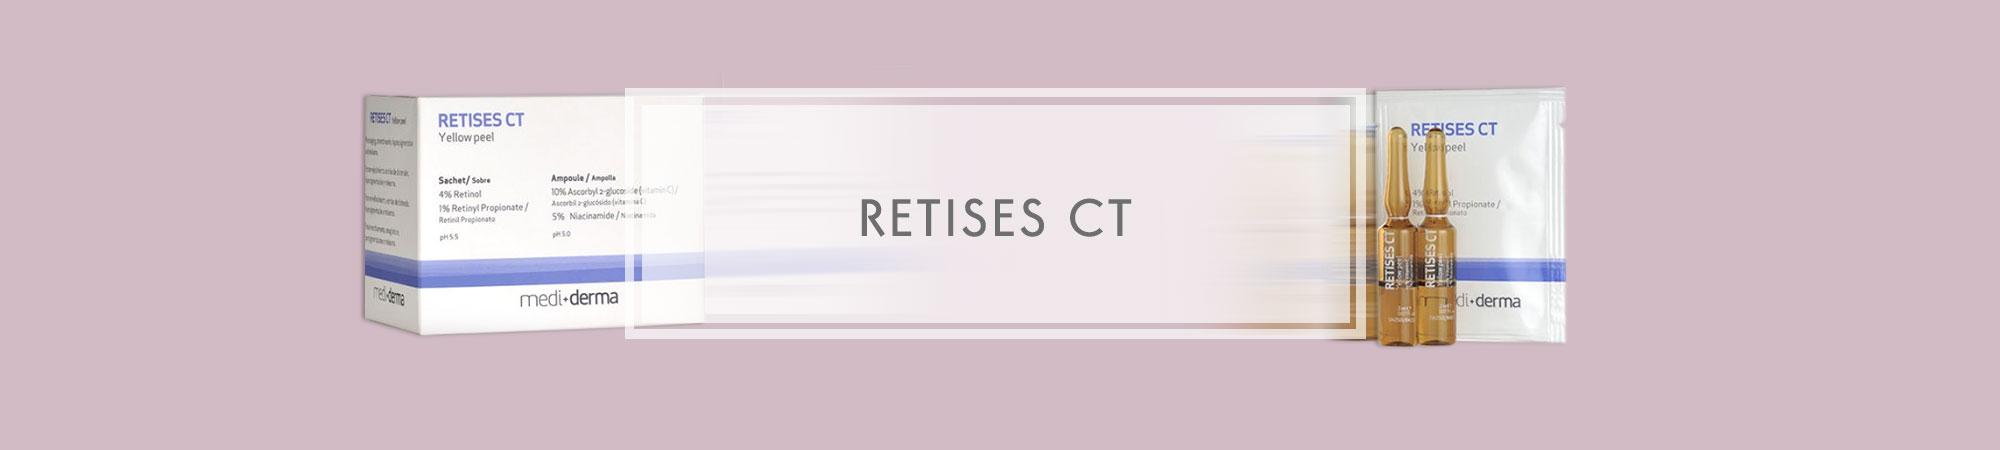 retises ct